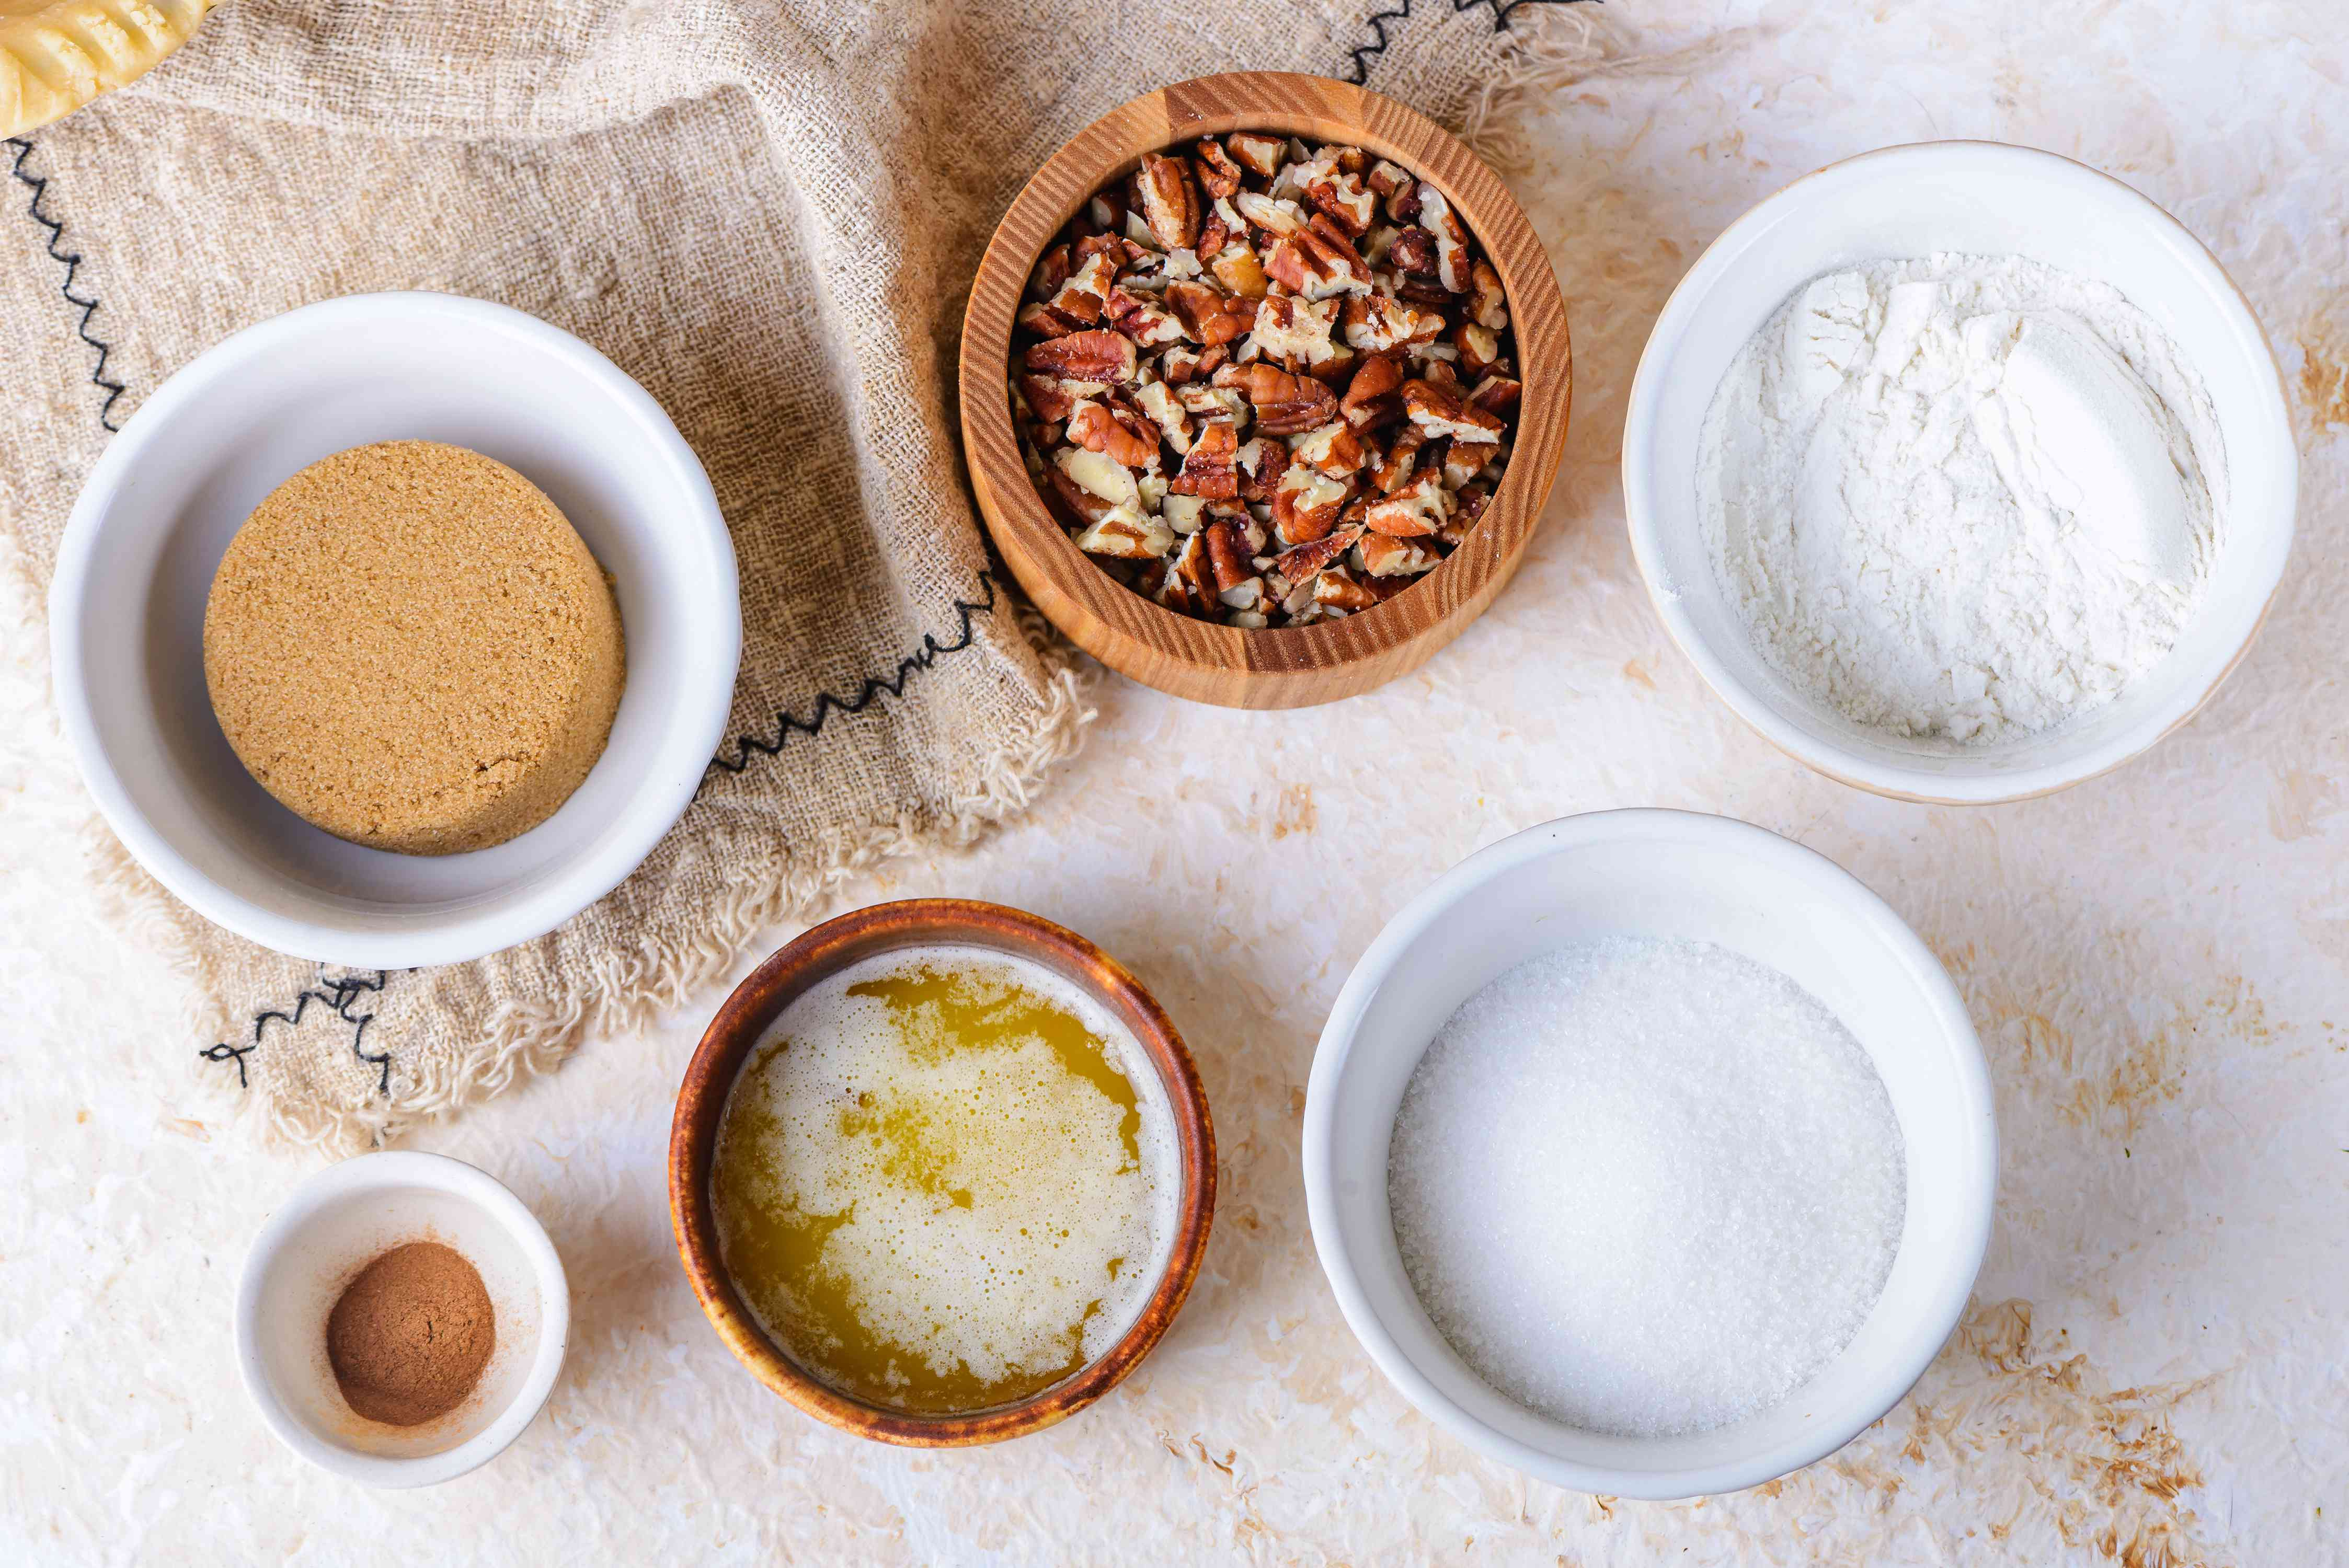 Ingredients for streusel